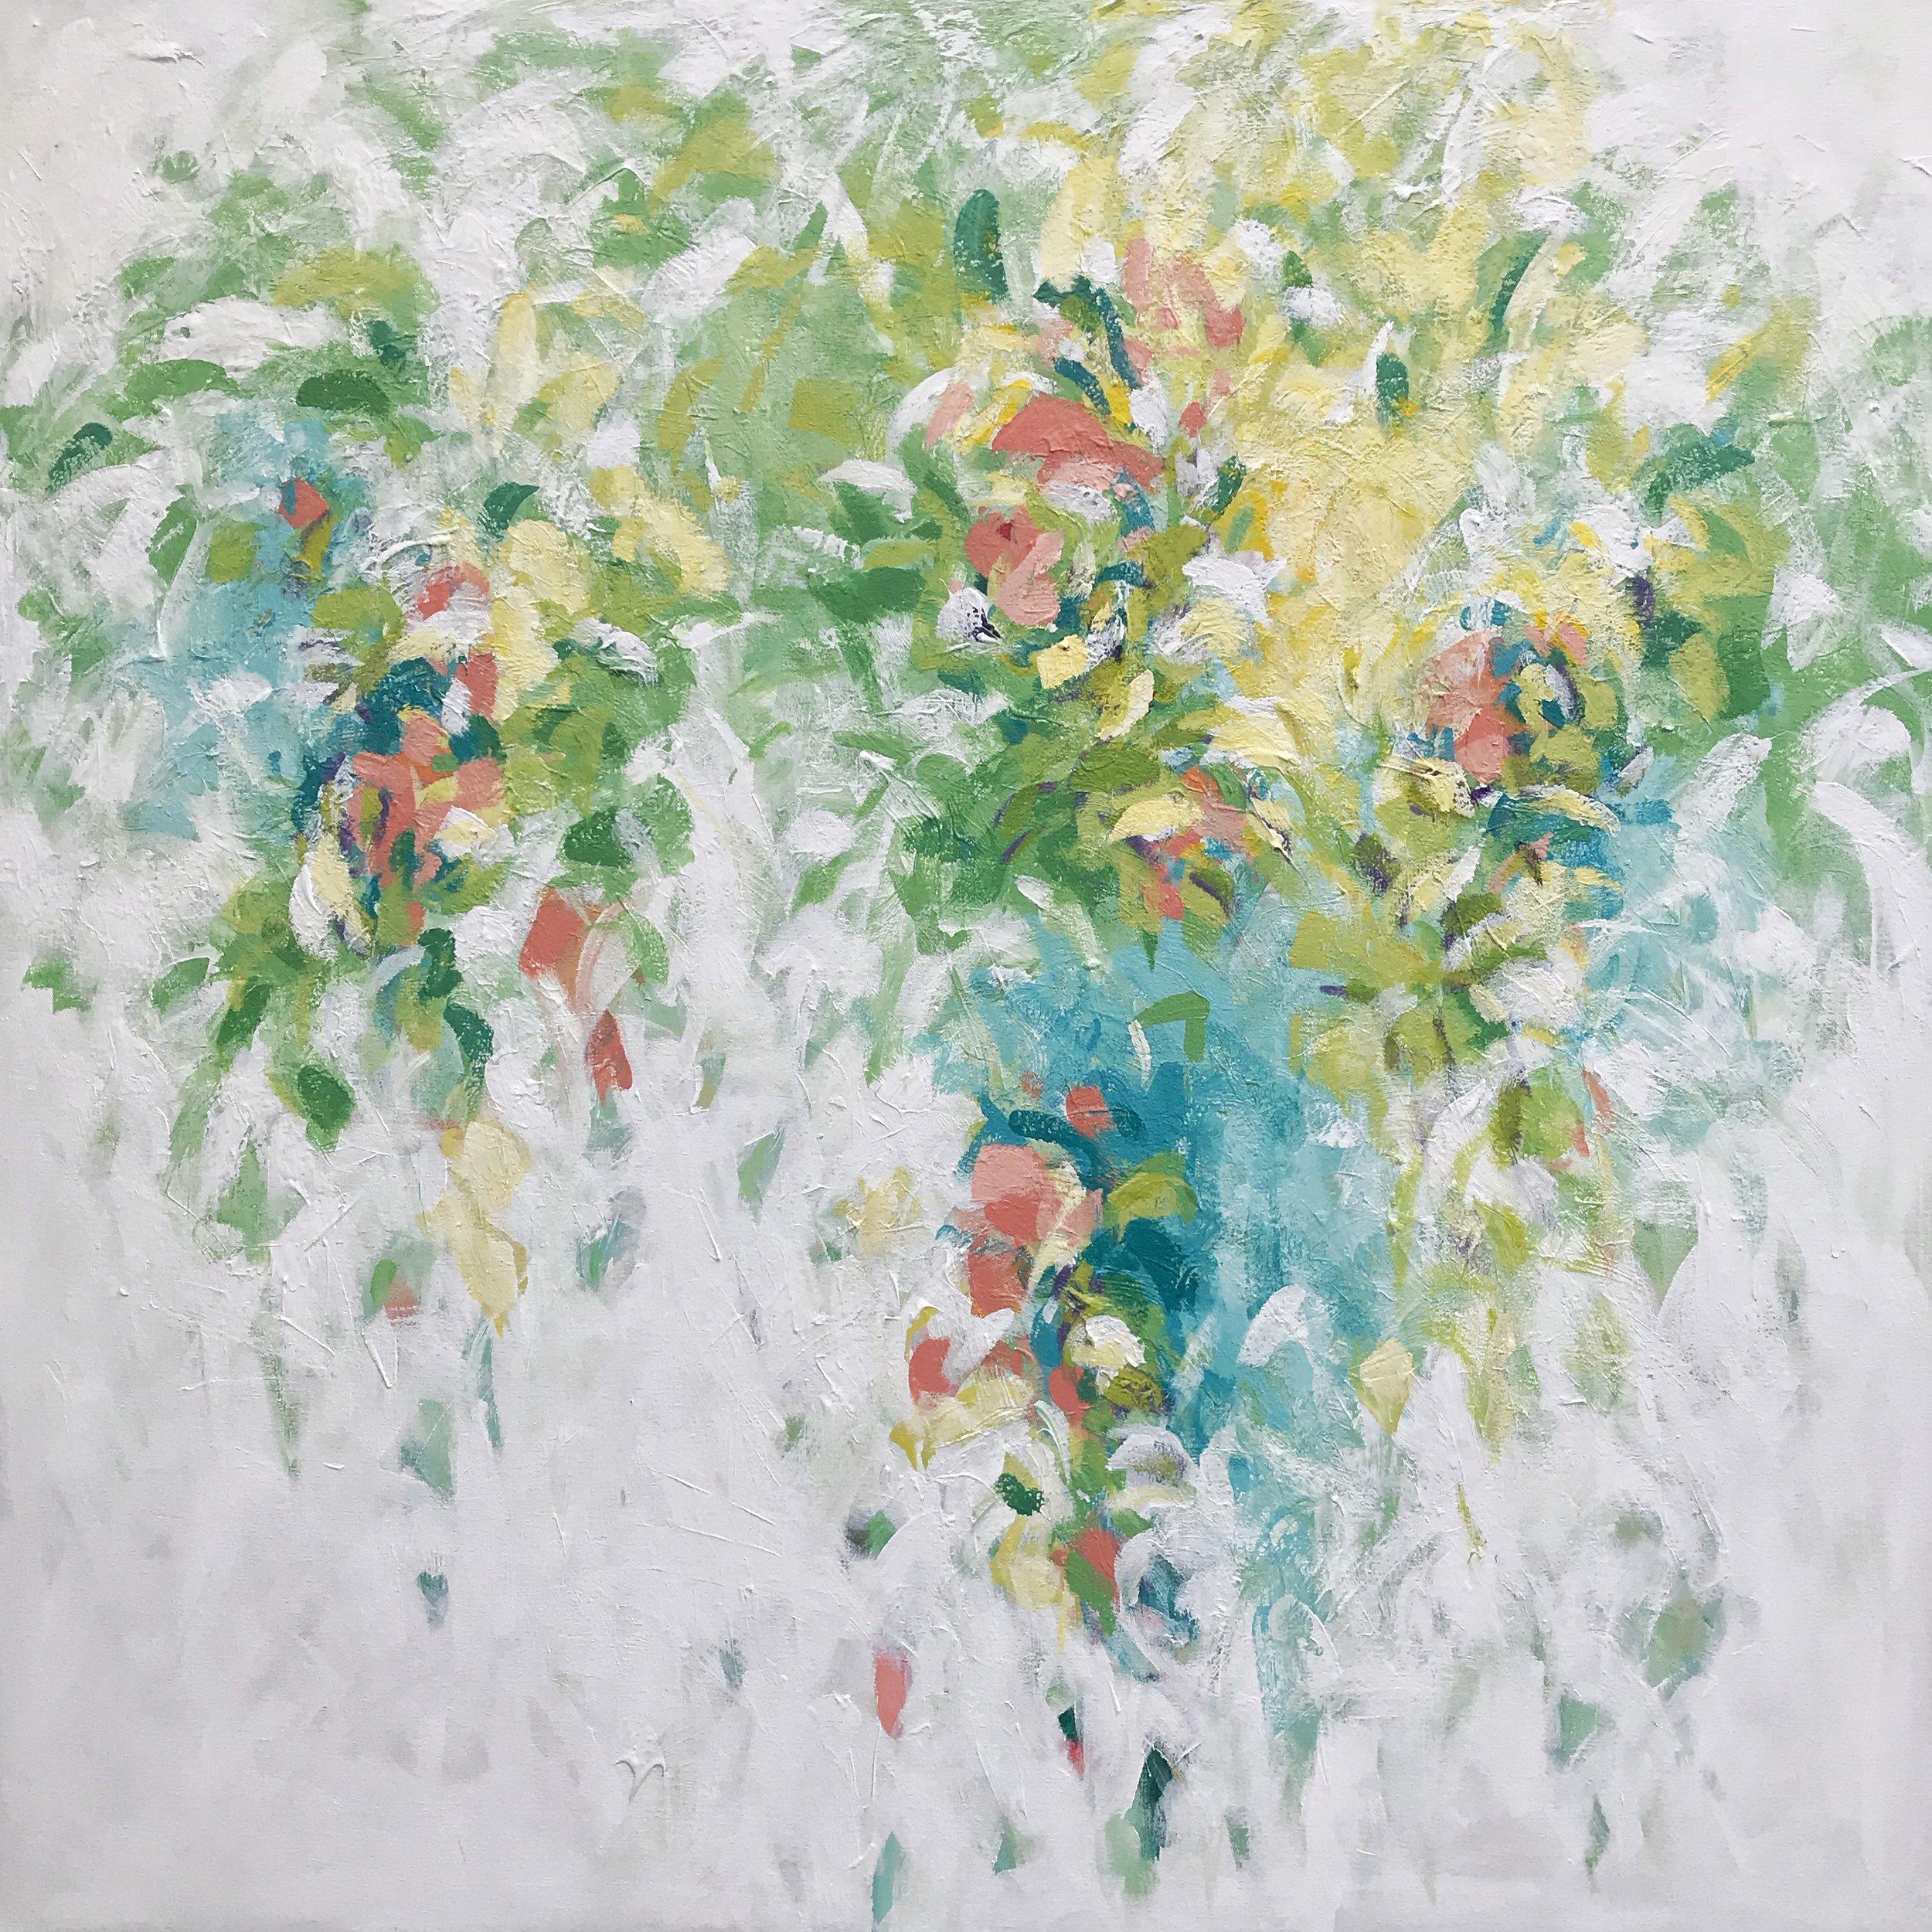 Overgrowth 6